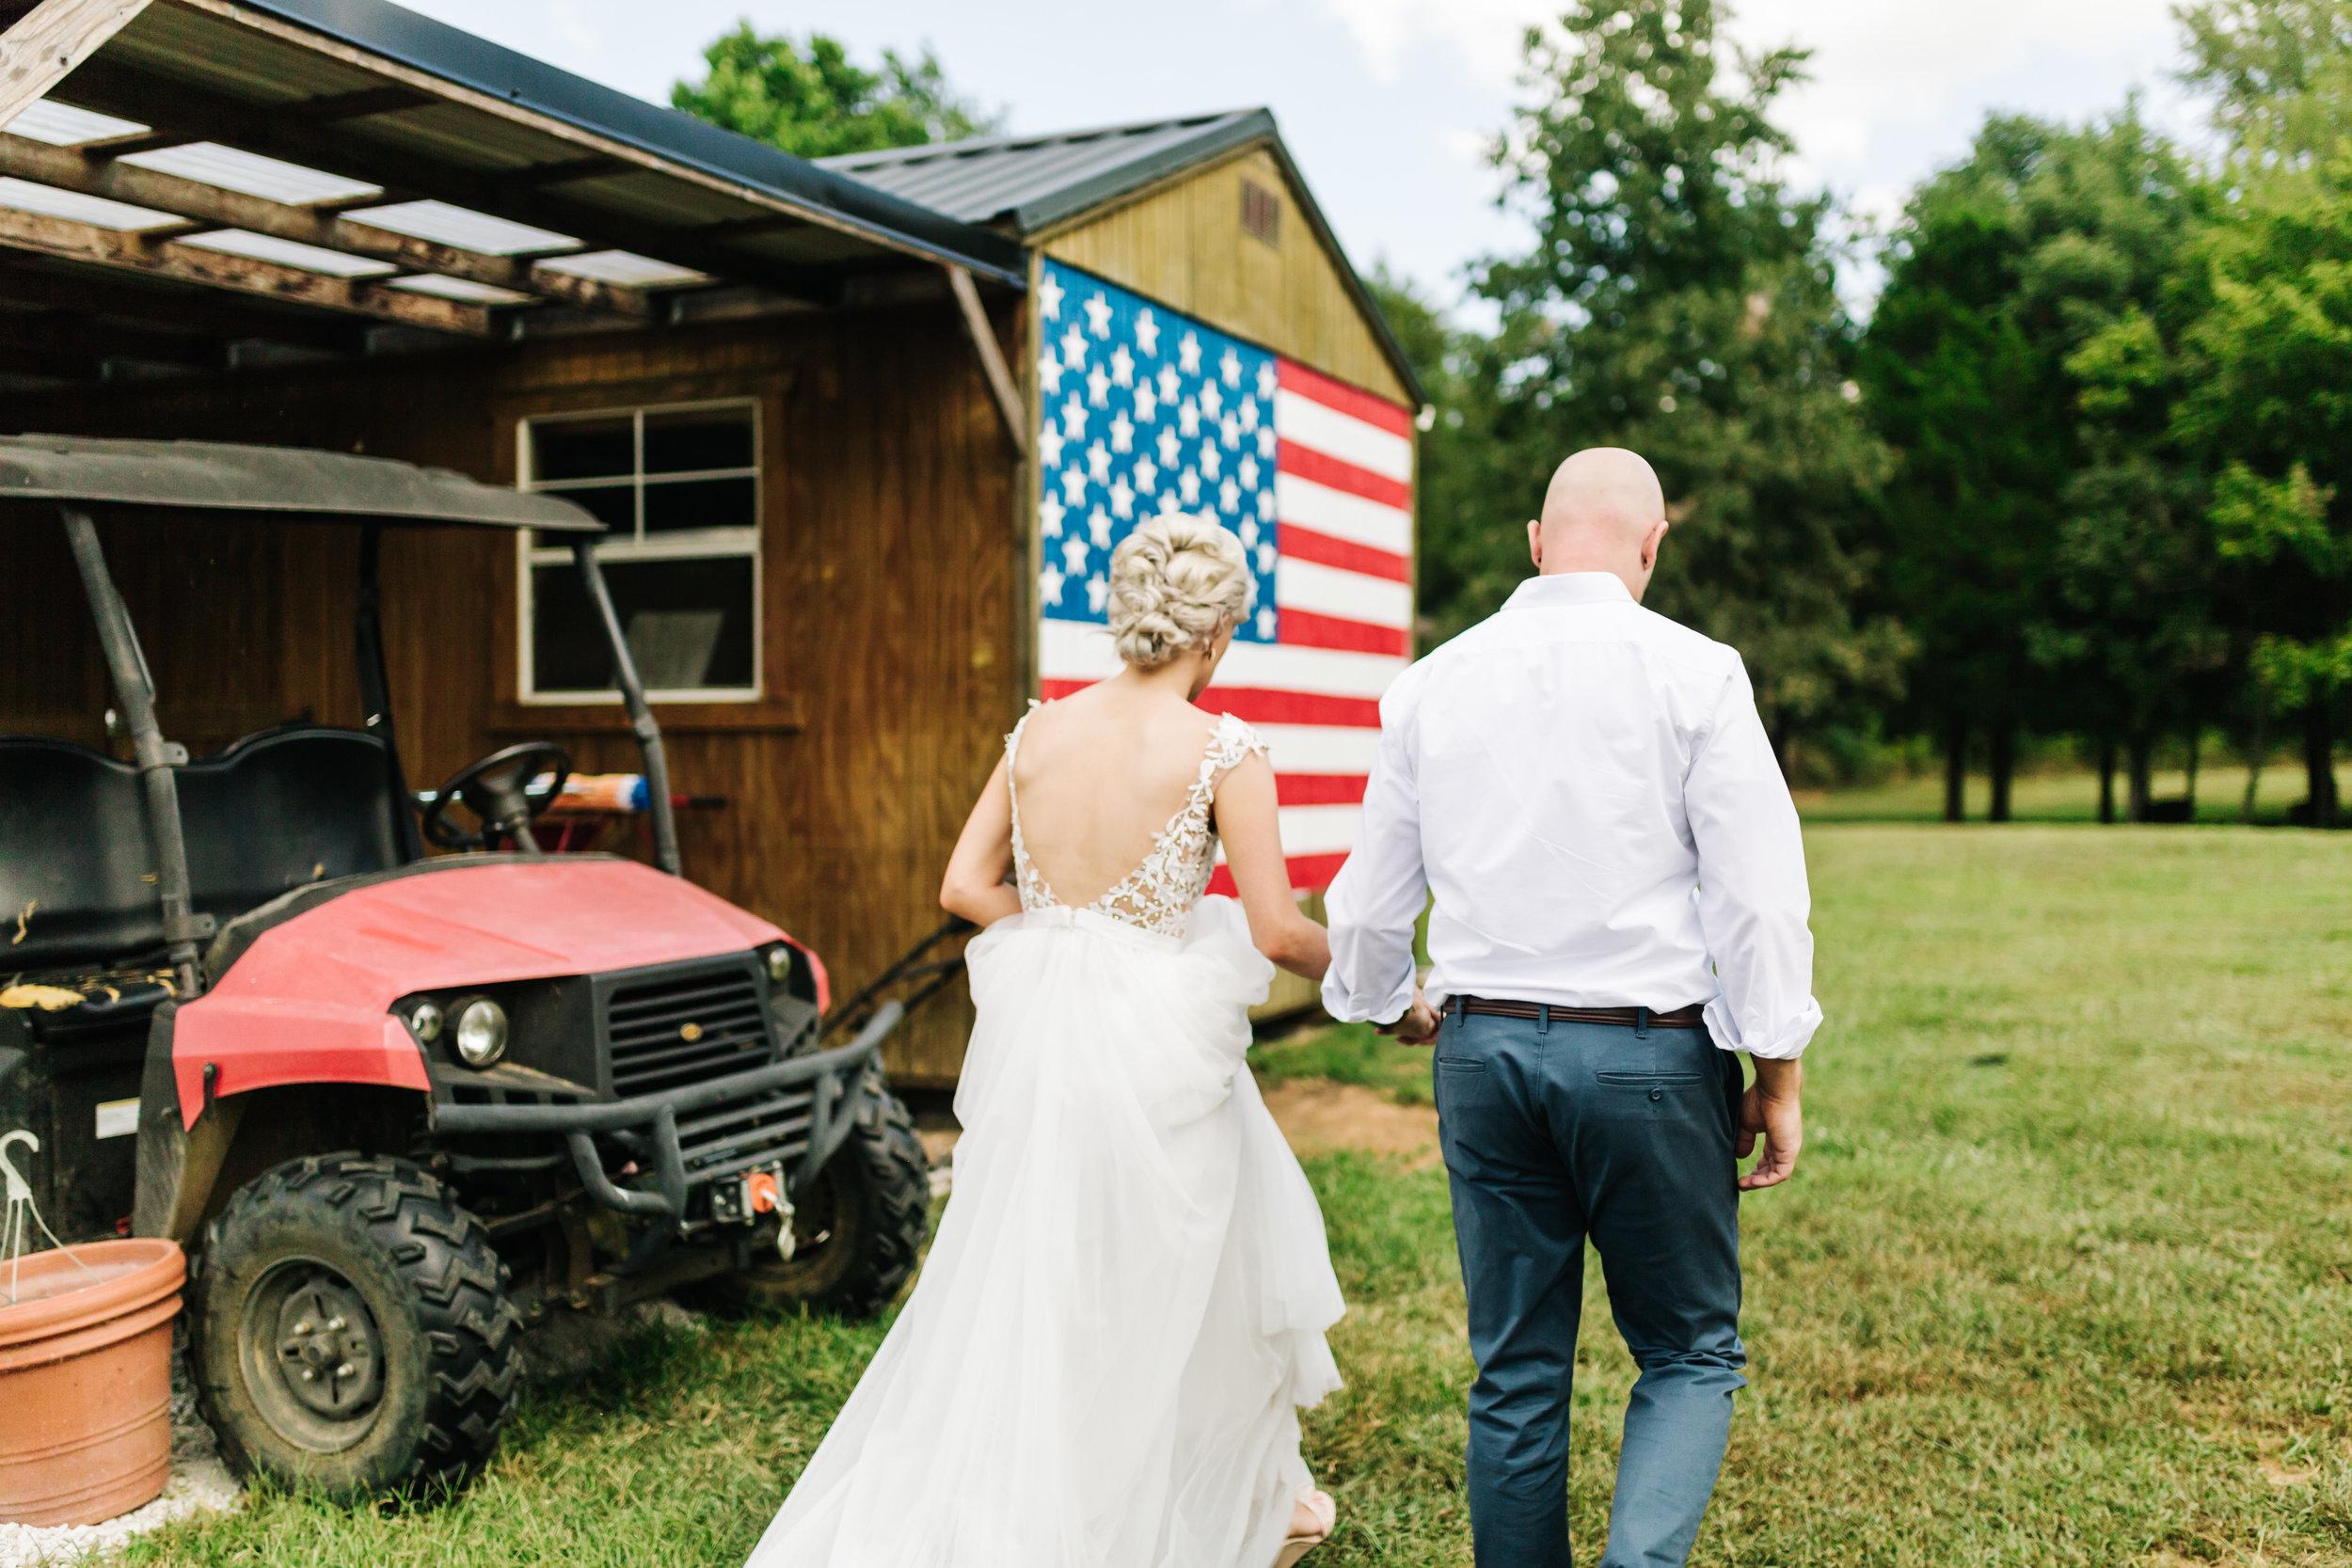 2018.09.02 Ray and Sarah Prizner Nashville TN Wedding FINALS-171.jpg